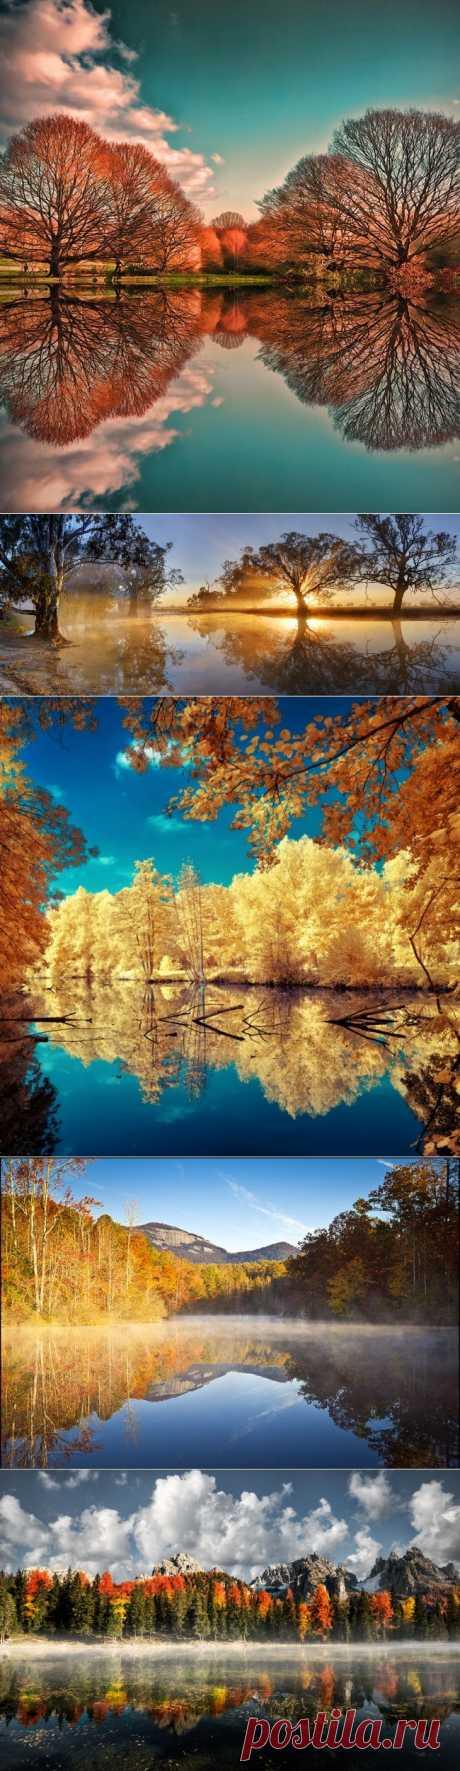 Mirror landscapes